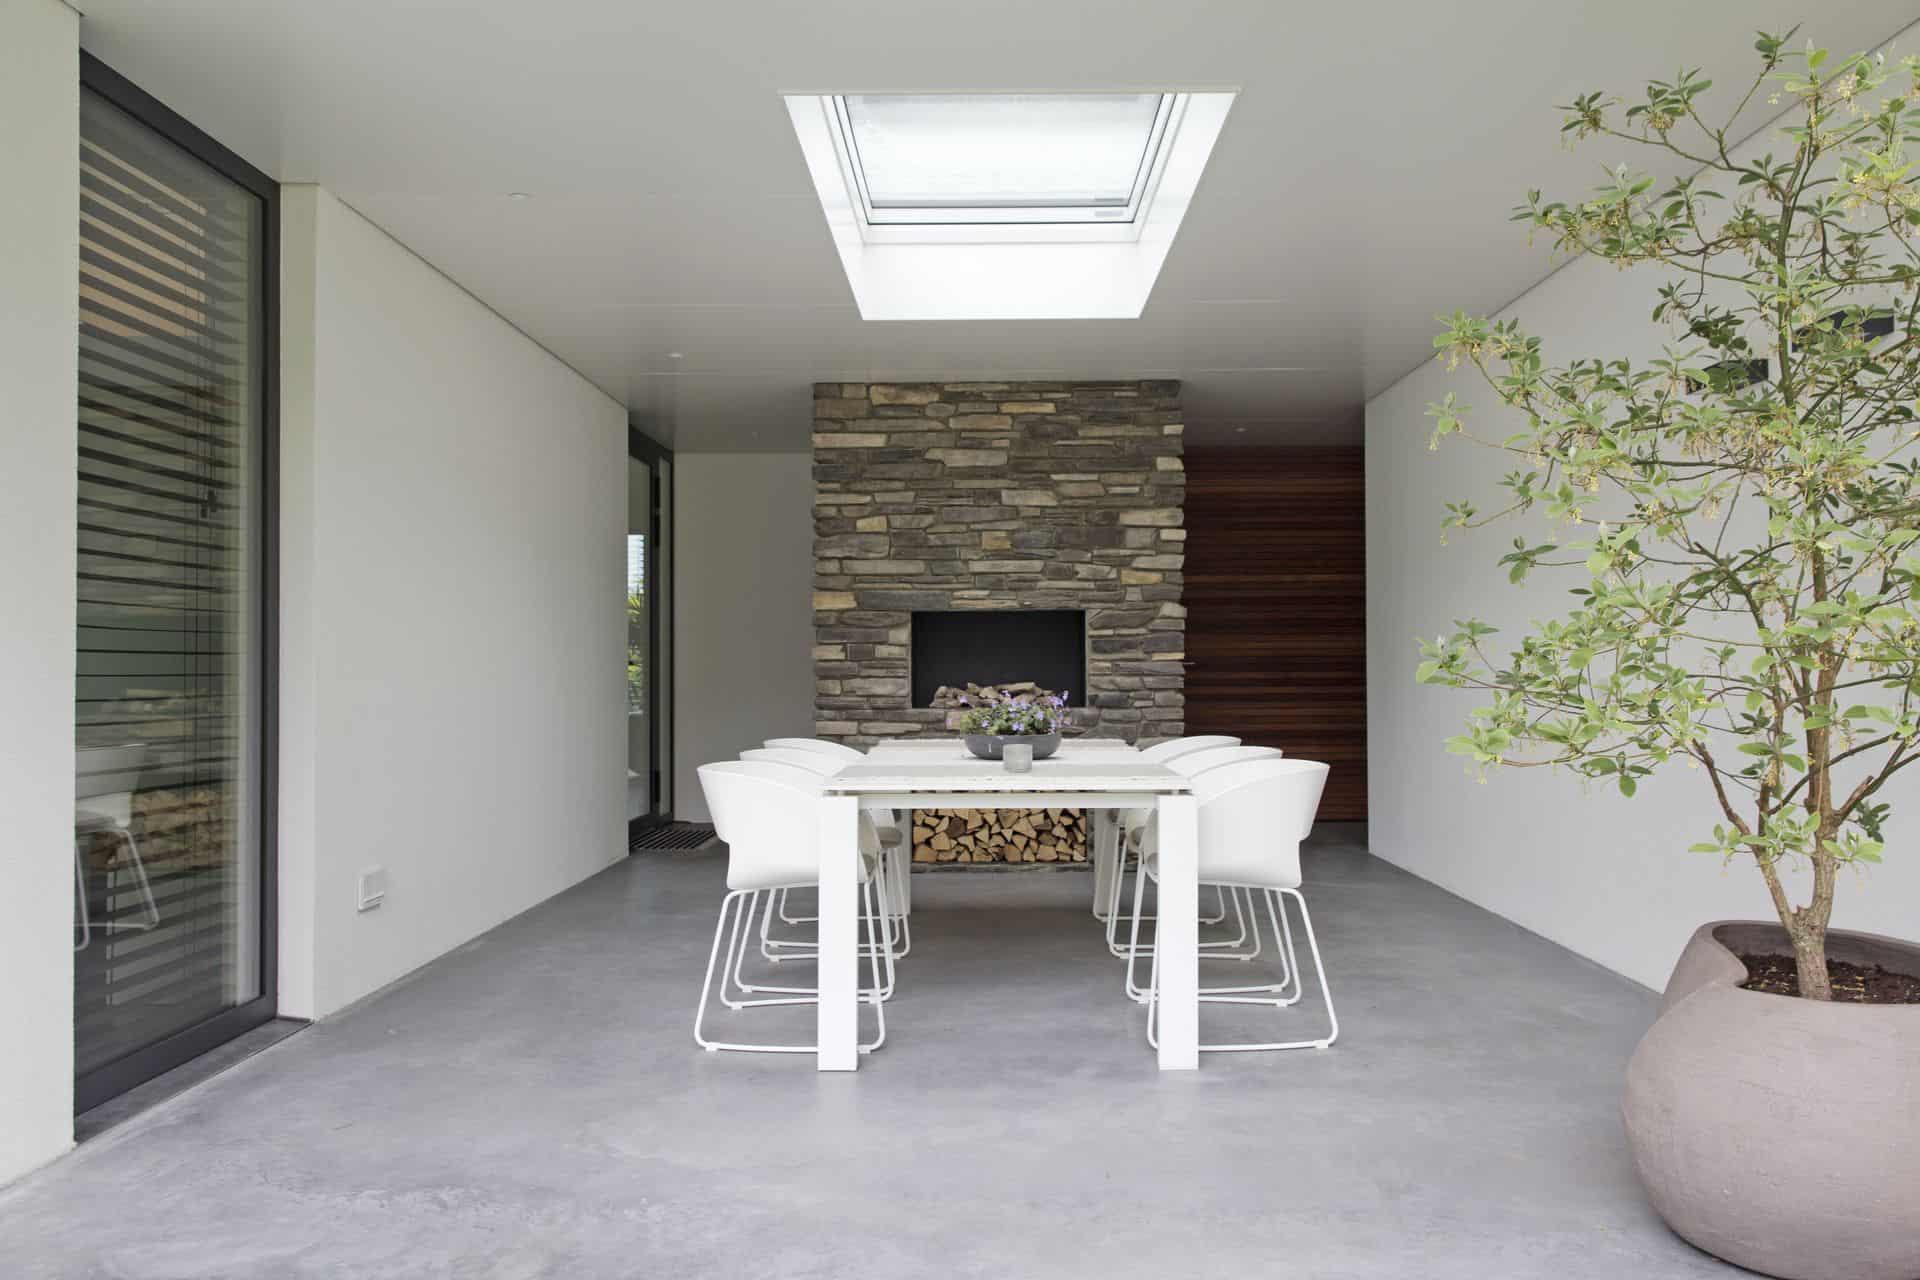 betonvloer buiten, beton terras